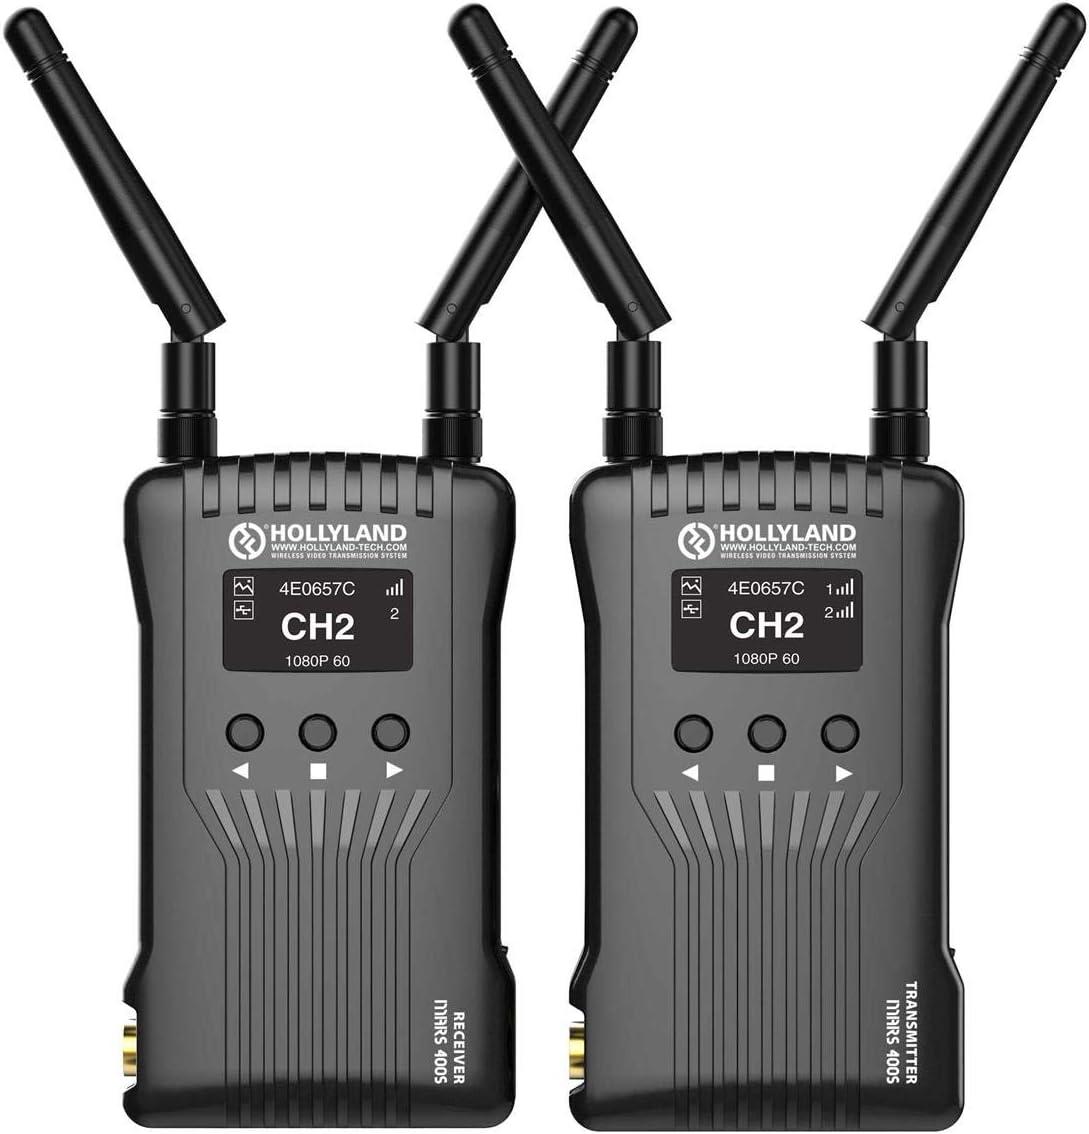 Hollyland MARS 400S SDI HDMI Video System Transmission online shopping Wireless Ranking TOP12